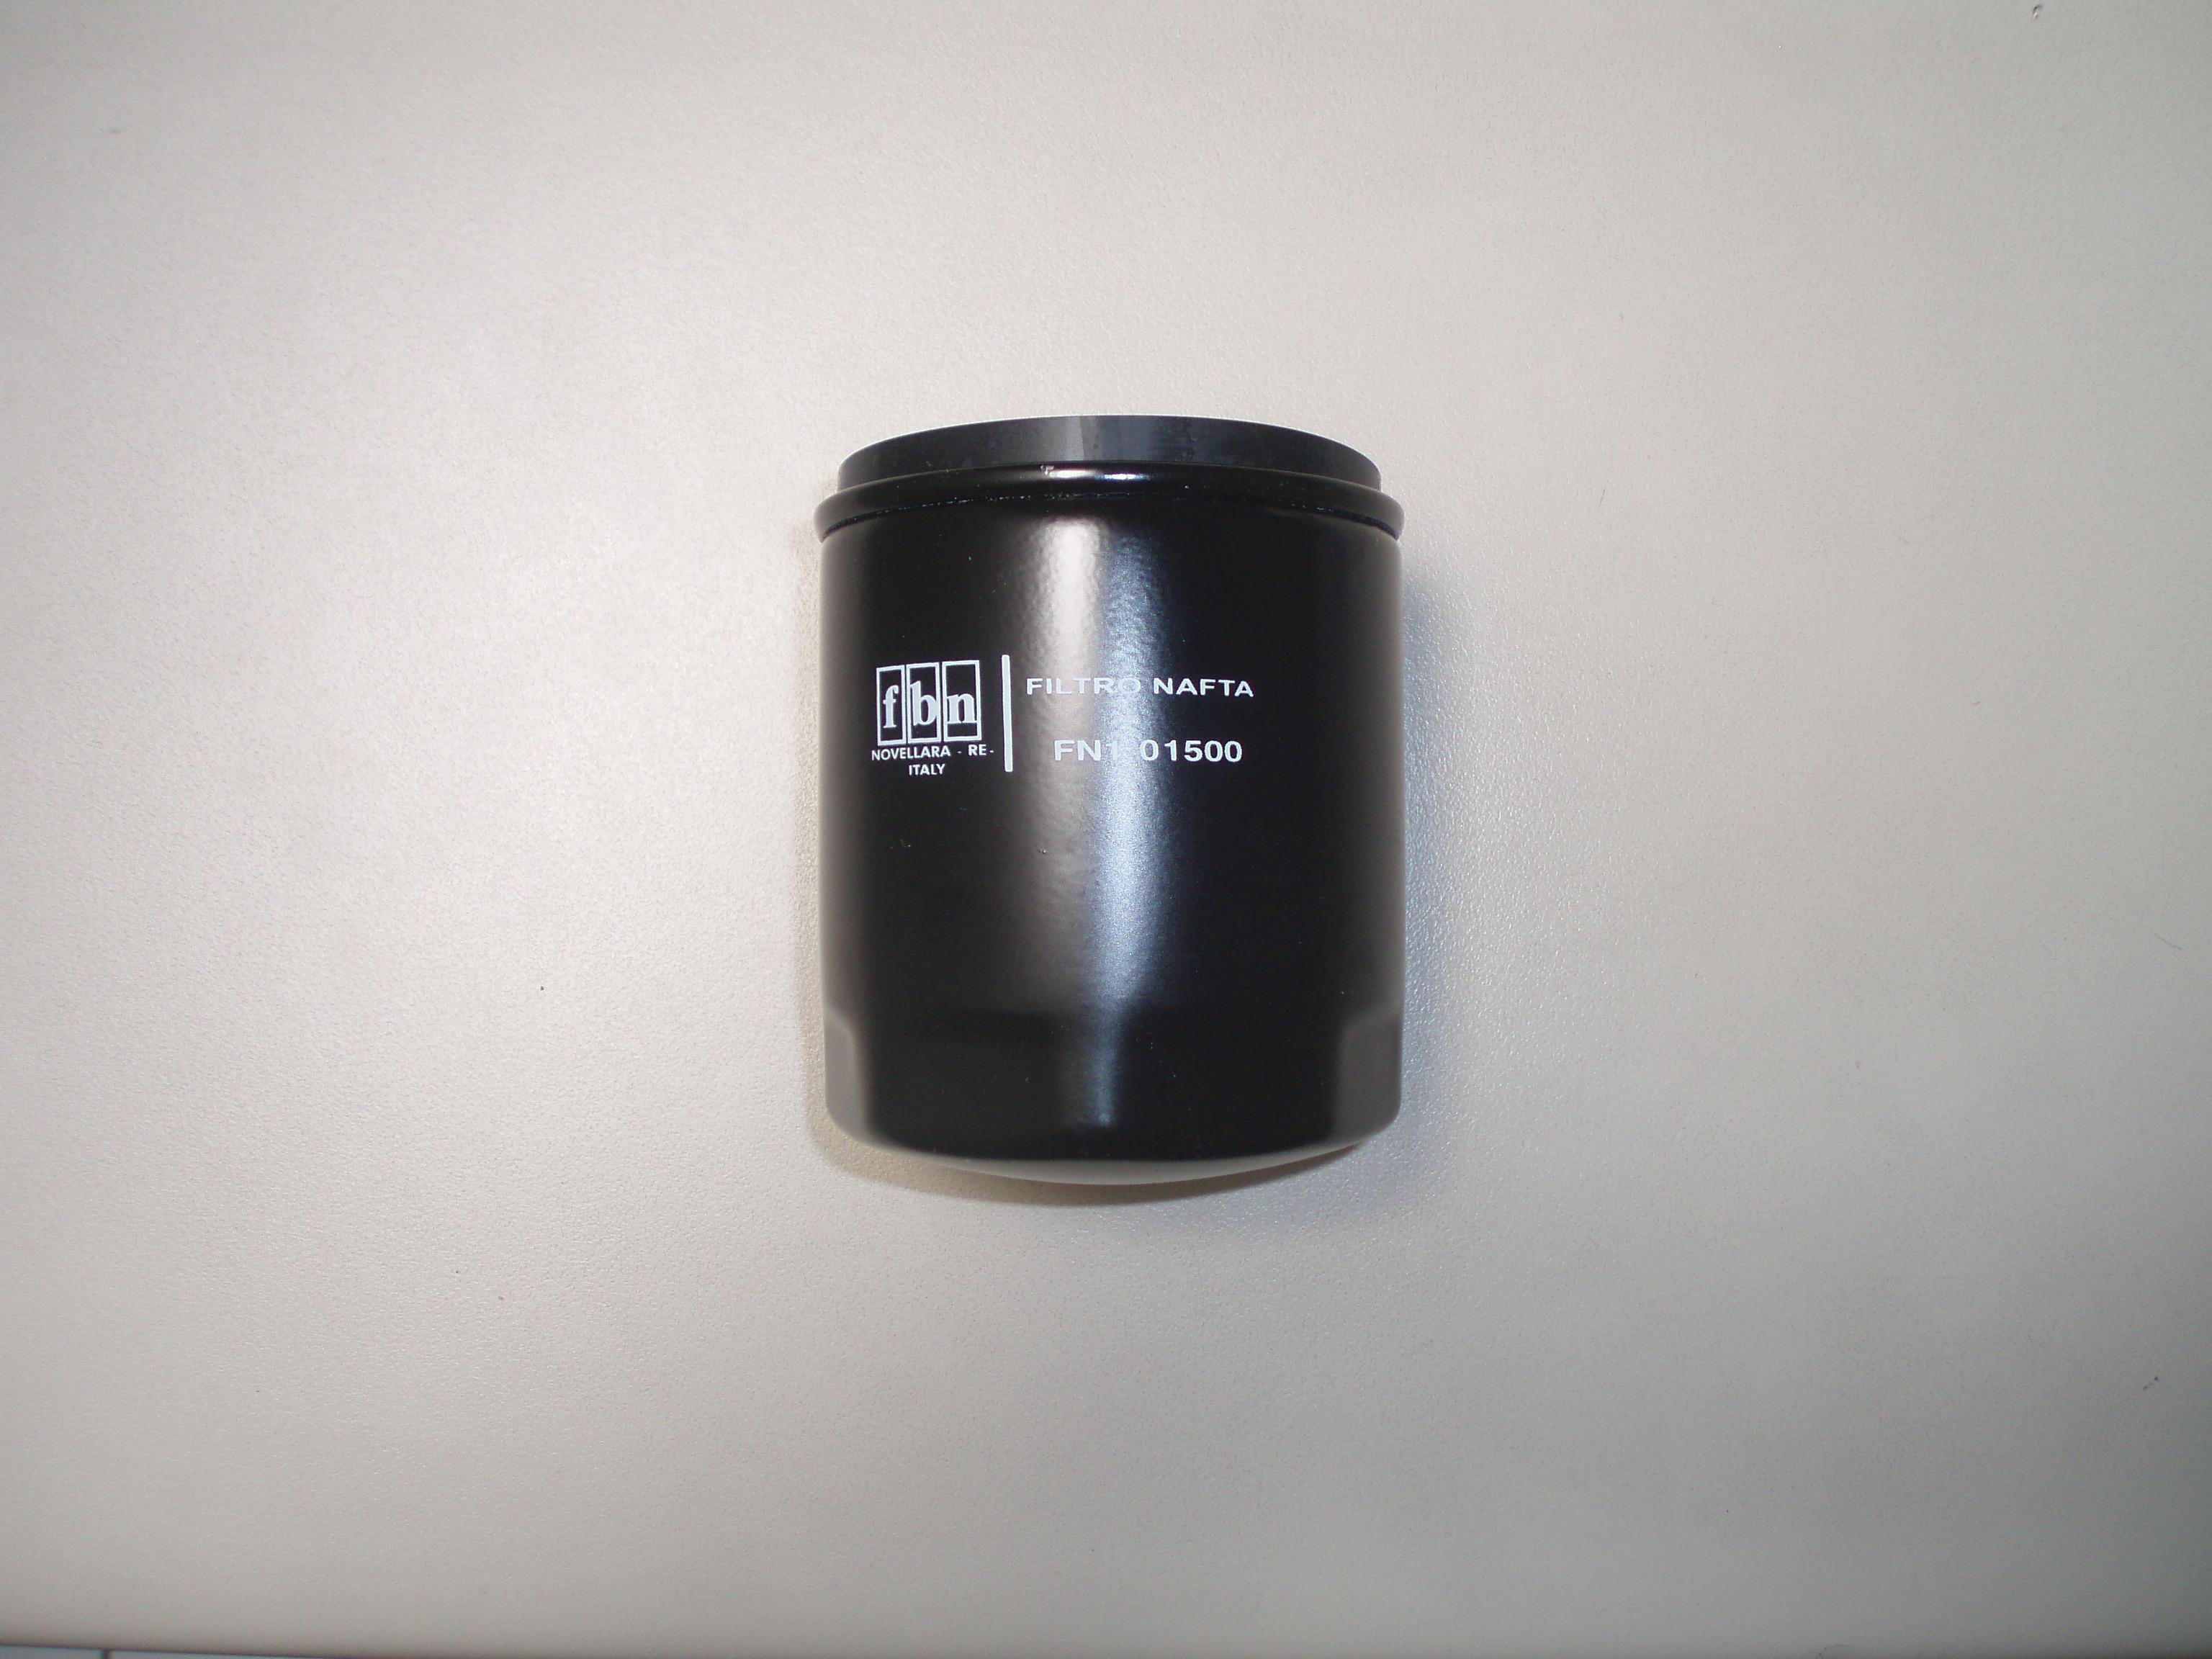 Filtre Gasoil 12LD LOMBARDINI RD220 RD240 RD270 RD278 MD300/301 MD350 RUGGERINI 2175083 HATZ 000050251500 2L40 3L40 4L40 2L41C 3L41C 4L41C 2M40 2M41 3M40 3M41 4M40 4M41 (FBN FN1.01500)